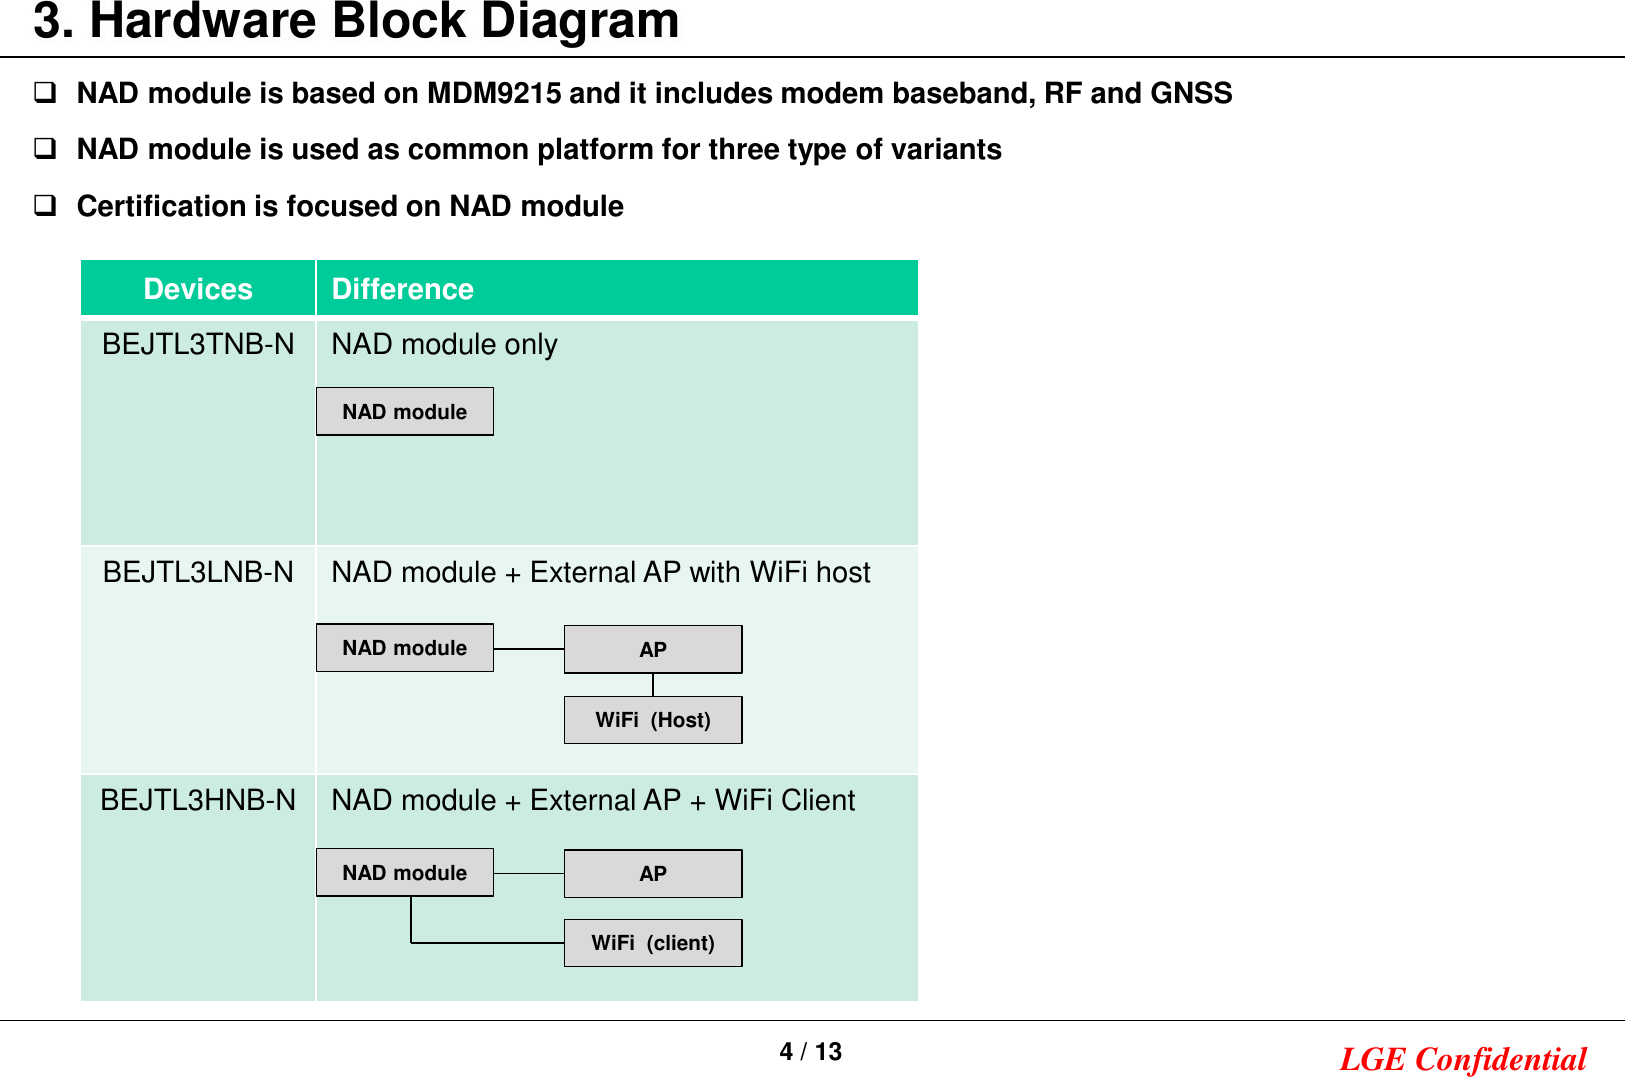 Lg Electronics Usa Tl3hebn Car Telematics Device User Manual 0 Hardware Block Diagram Diagramnad Module Is Based On Mdm9215